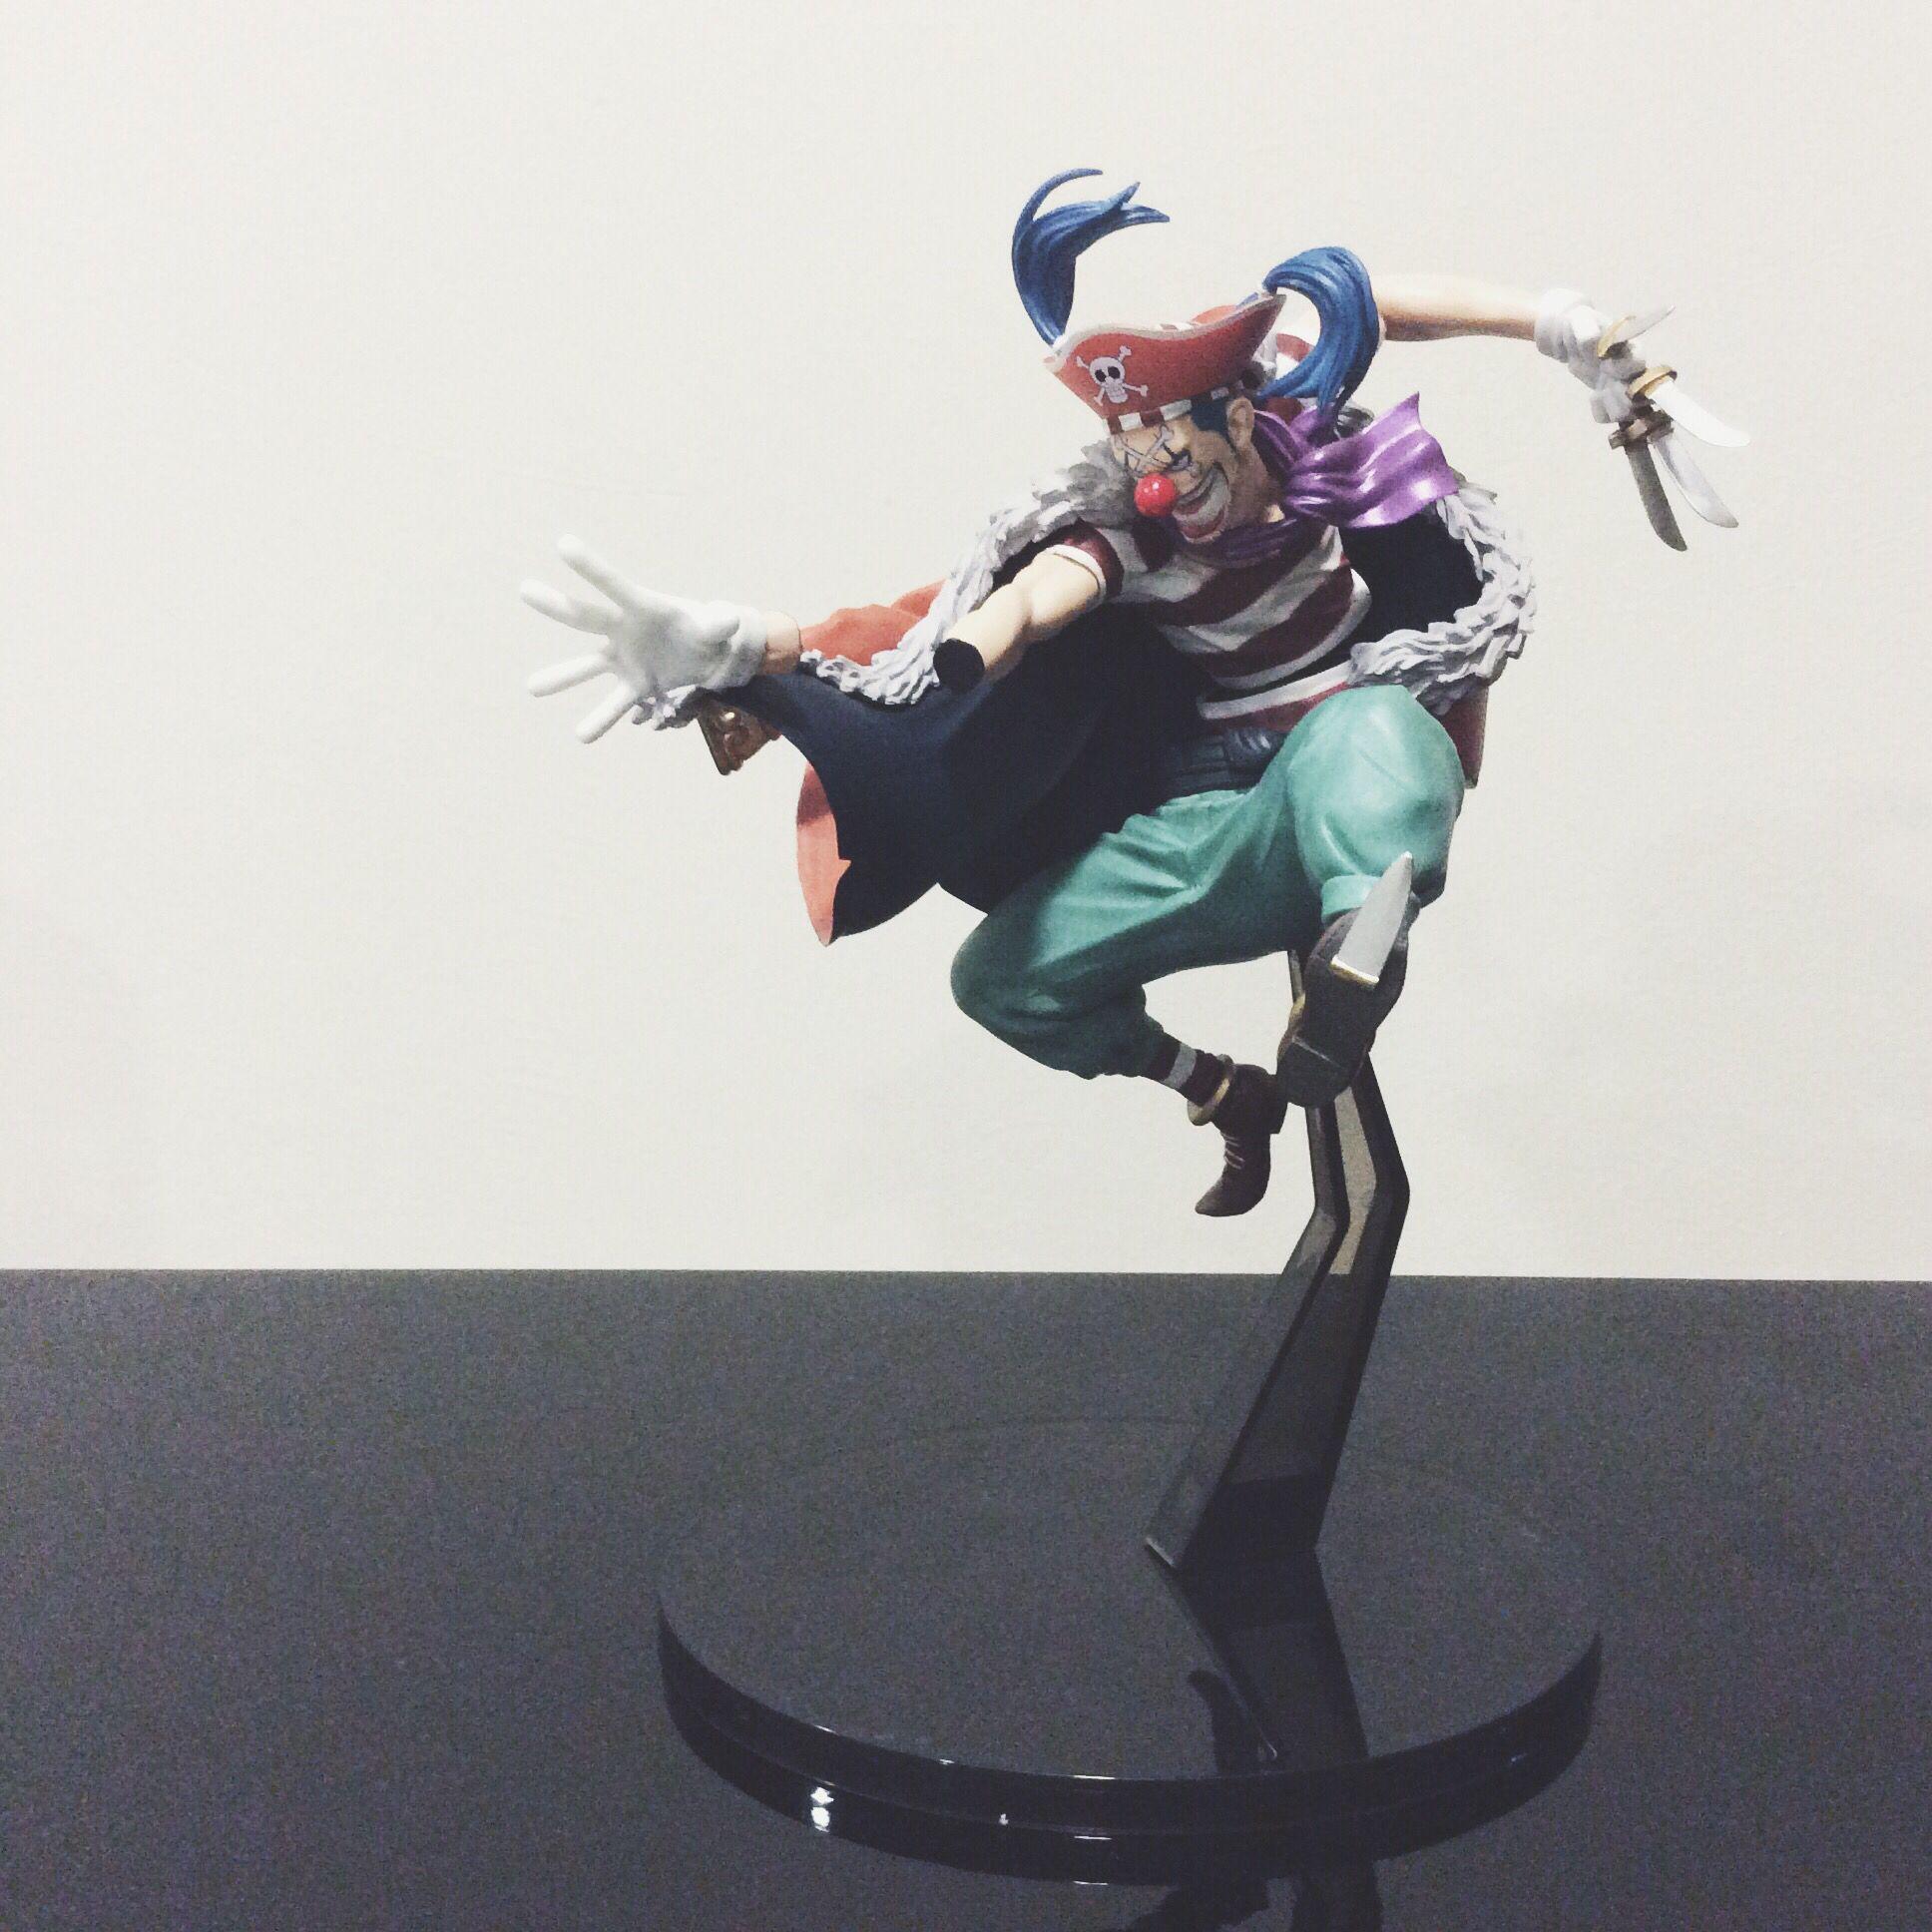 One Piece Buggy Banpresto Figure Colosseum IV 4 SCultures vol.4 New No Box